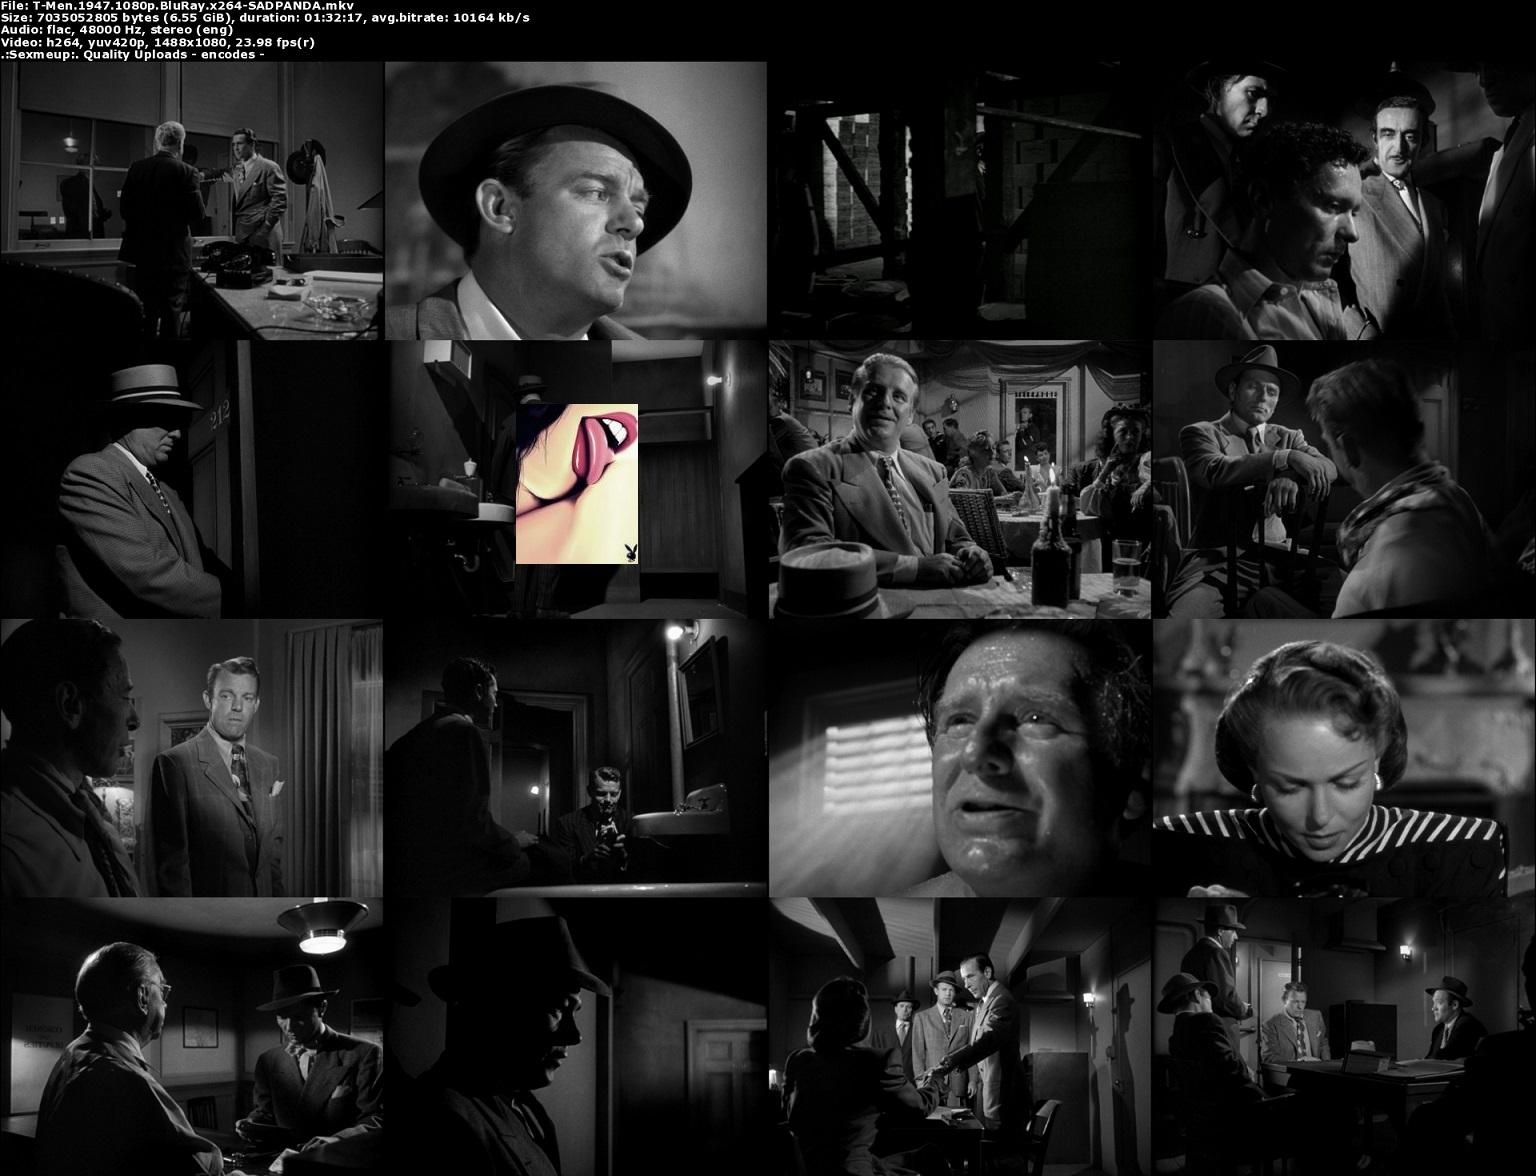 T-Men.1947.1080p.BluRay.x264-SADPANDA_s.